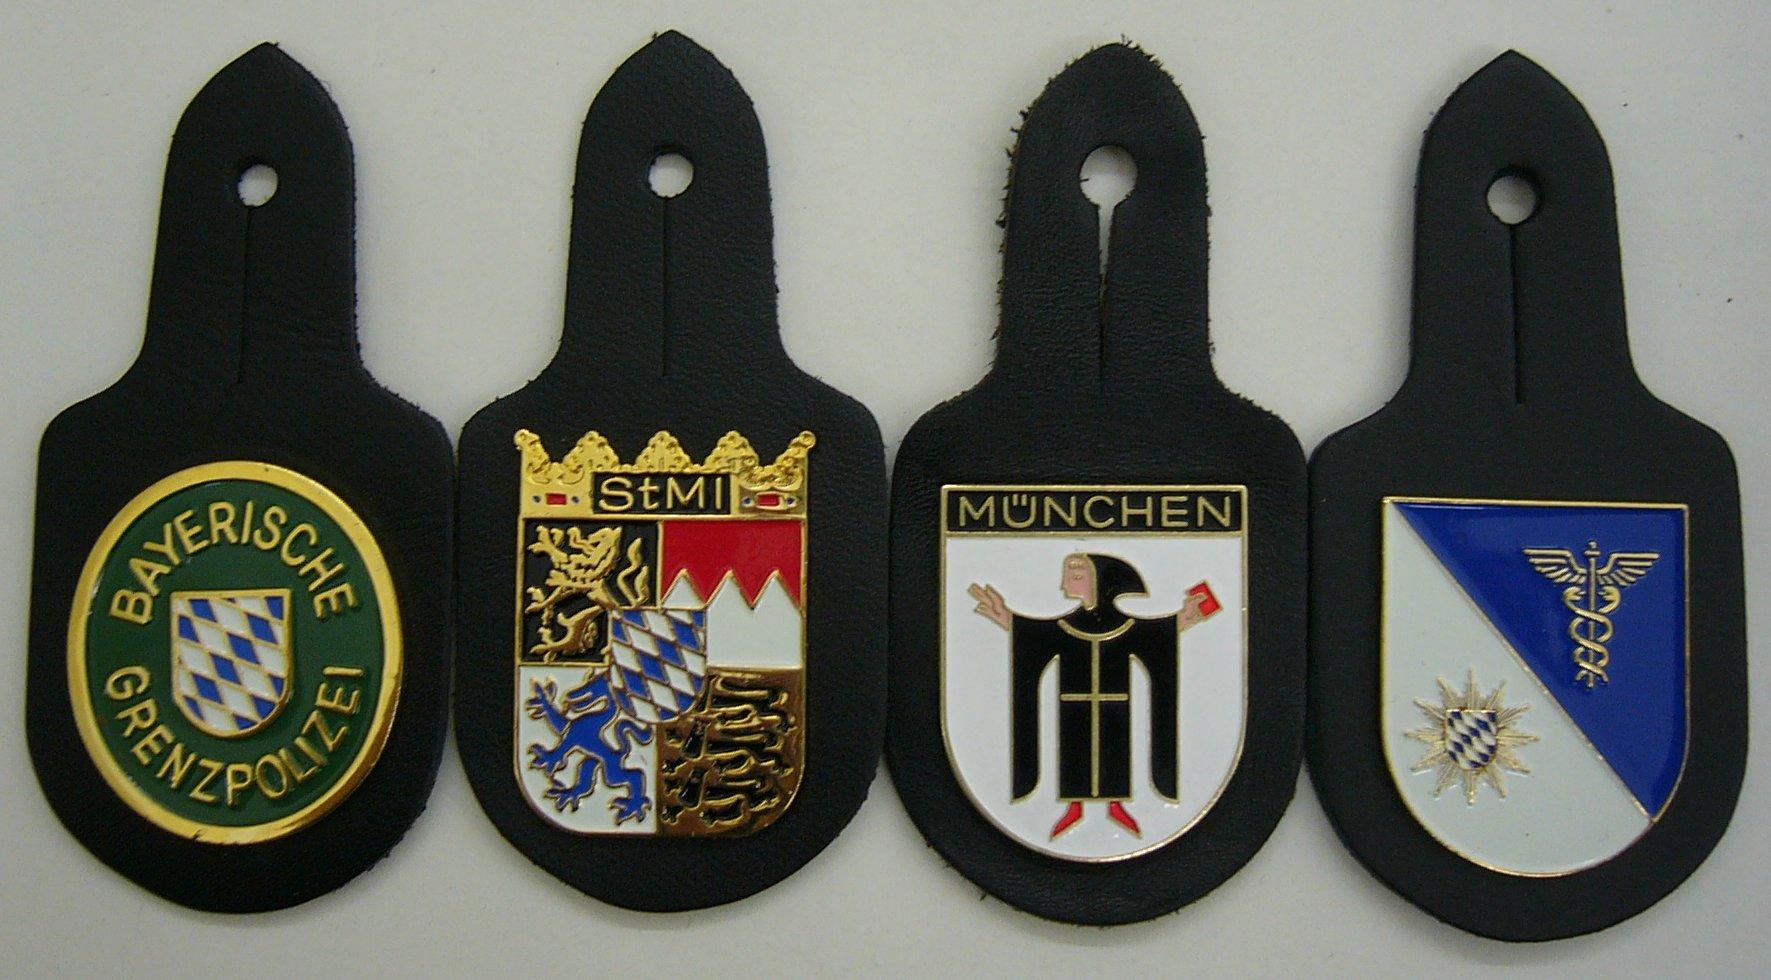 Polizei Bayern Wikipedia